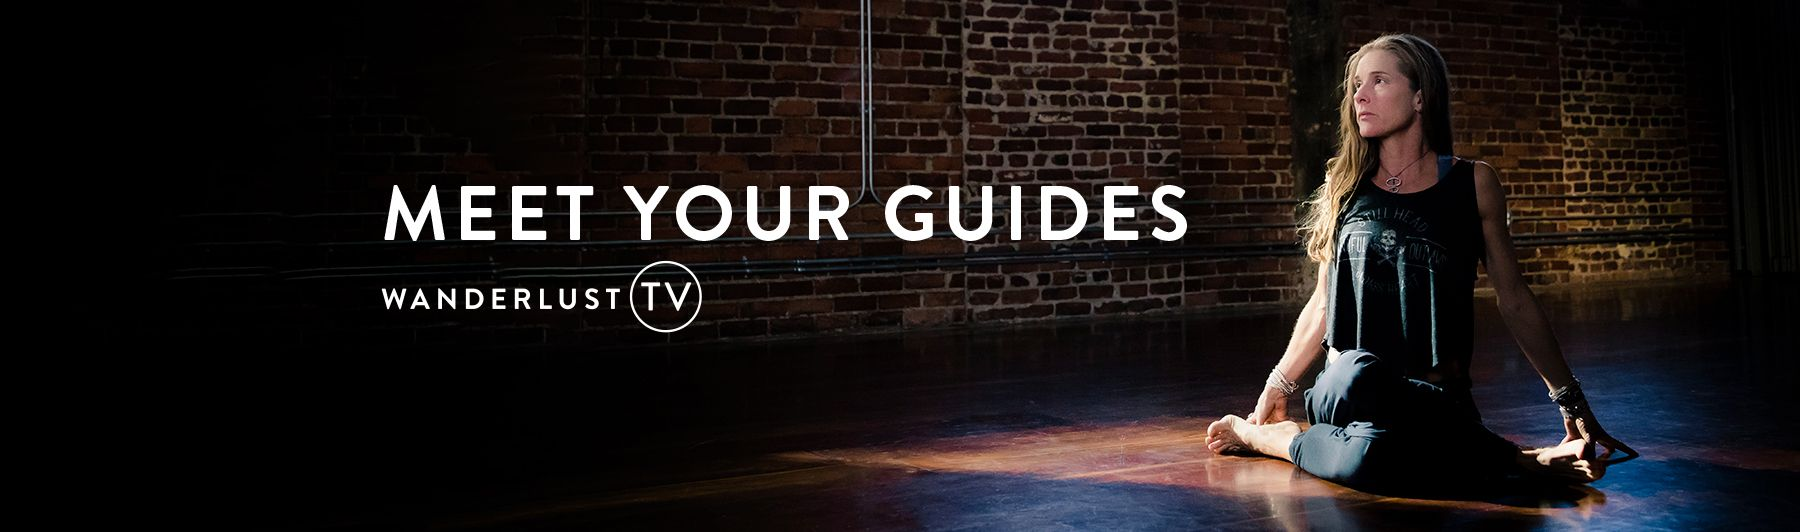 Wanderlust TV – Wanderlust